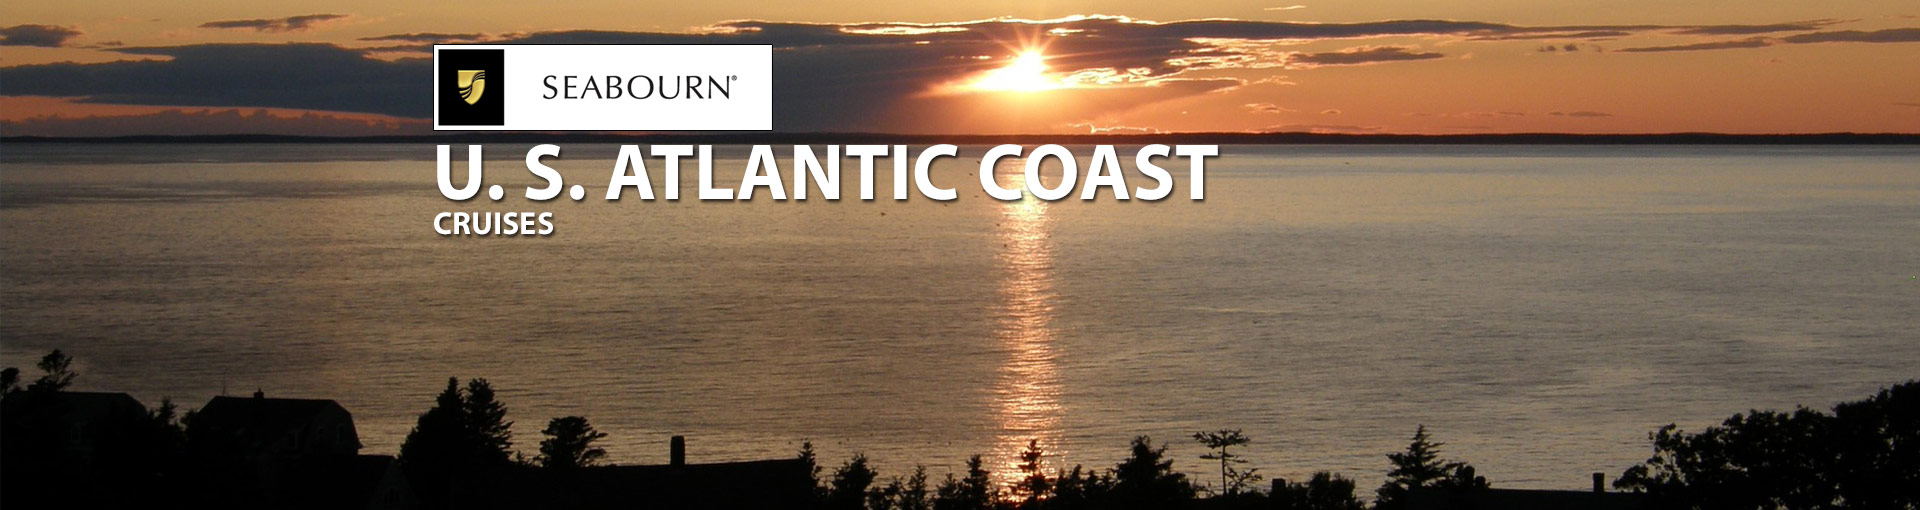 Seabourn: US Atlantic Coast